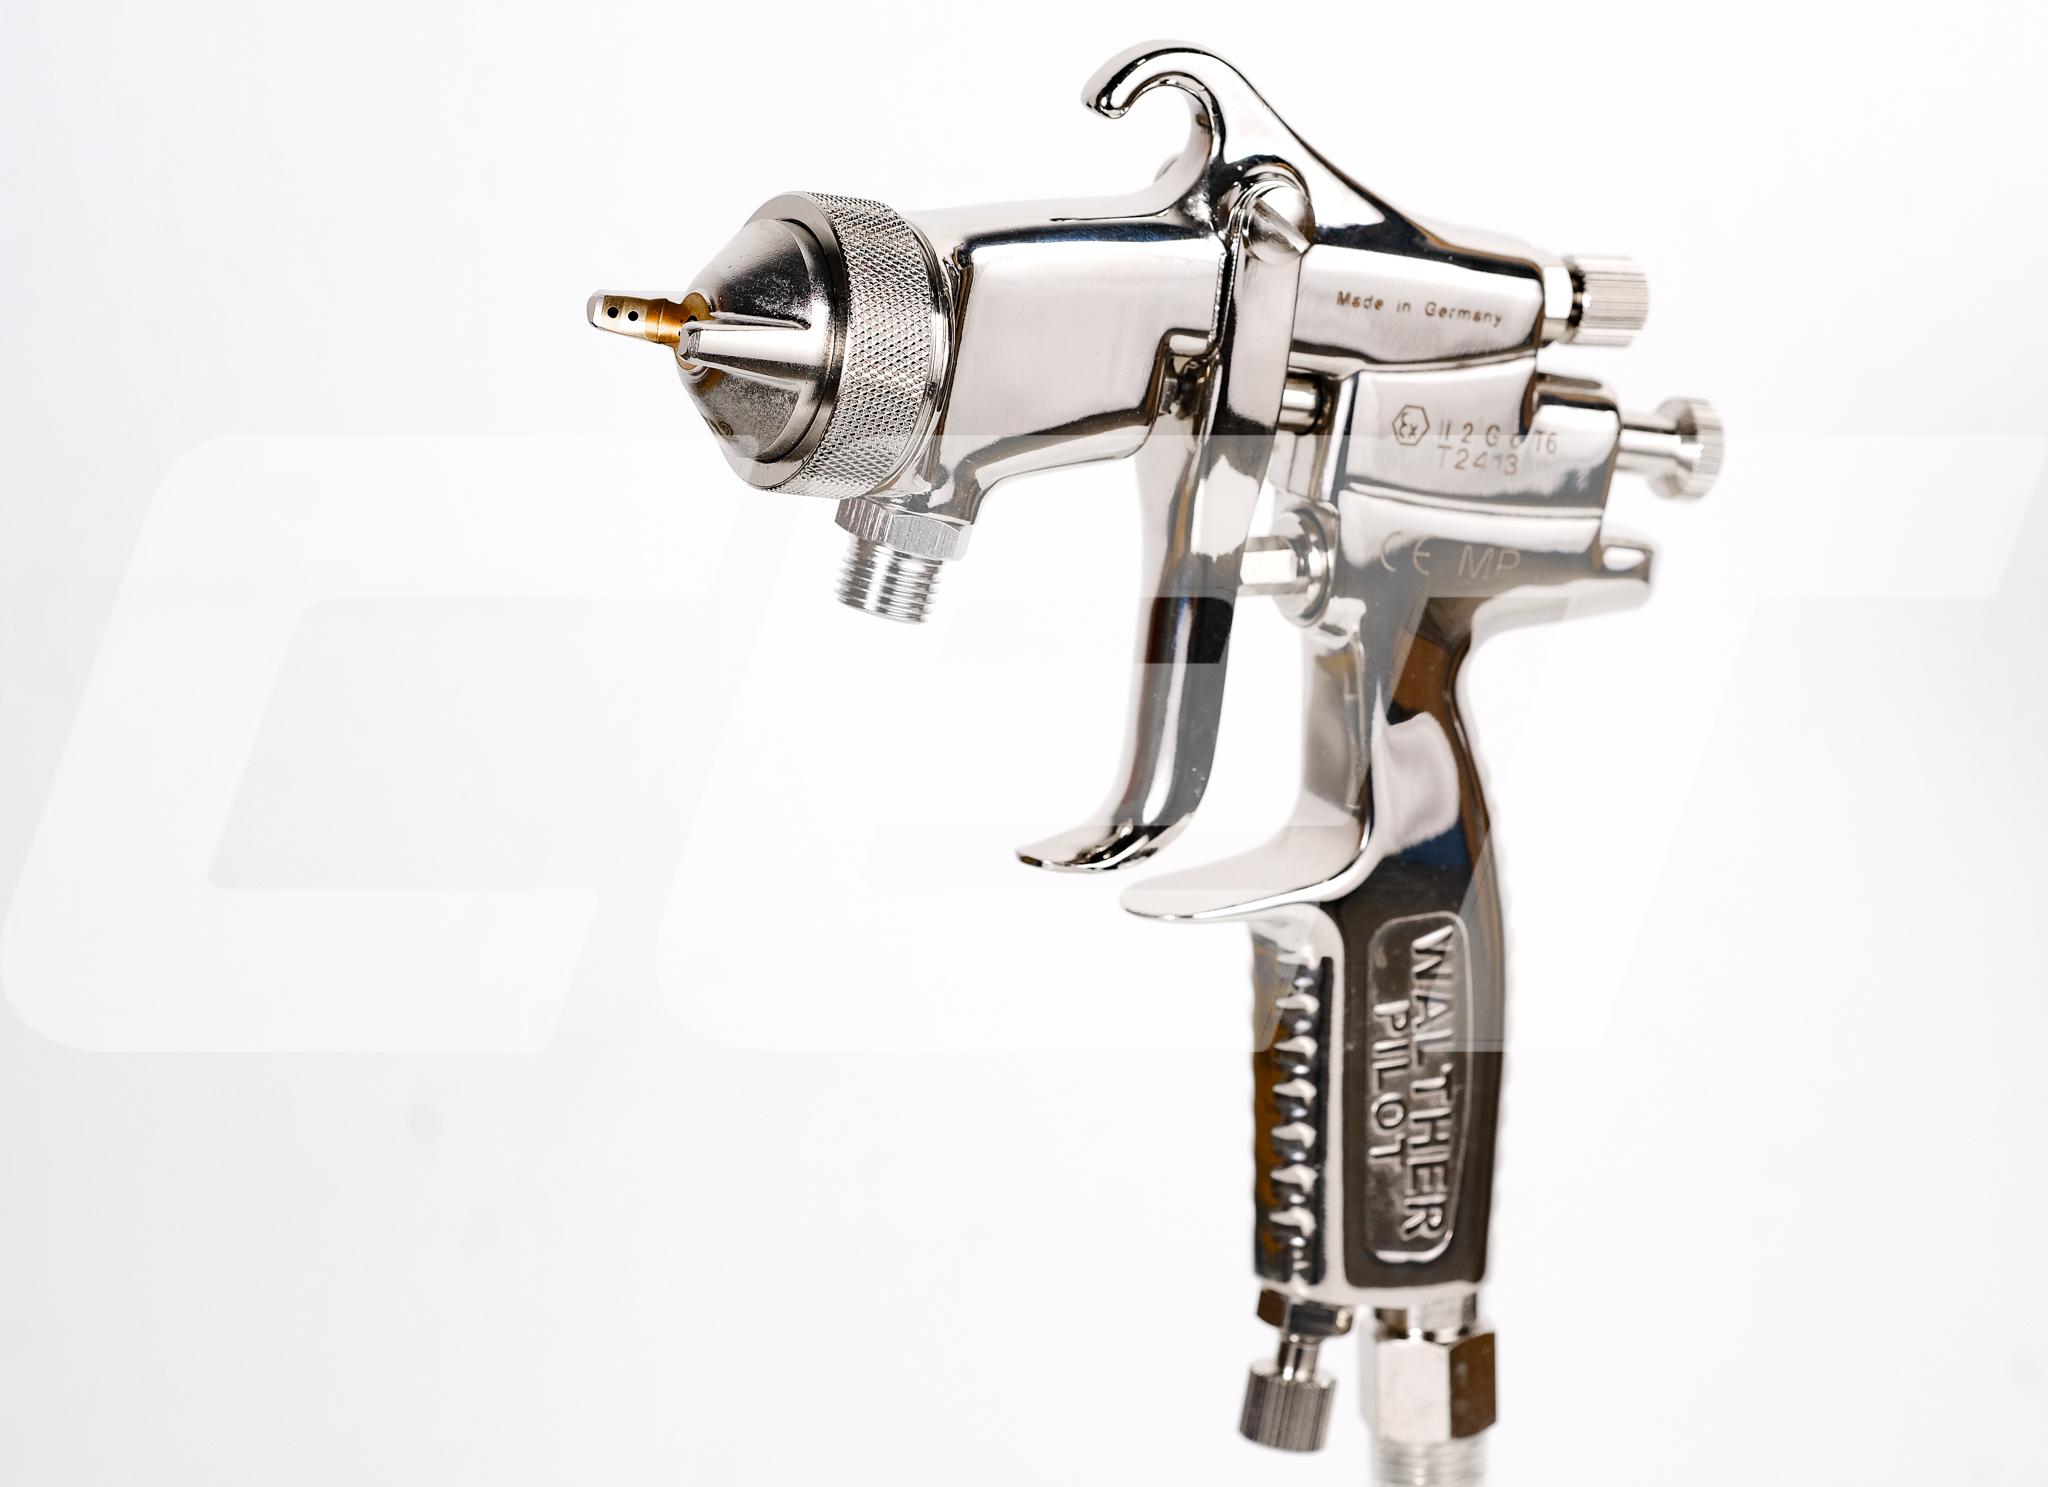 CET Special: PILOT Fine Finish Spray Gun